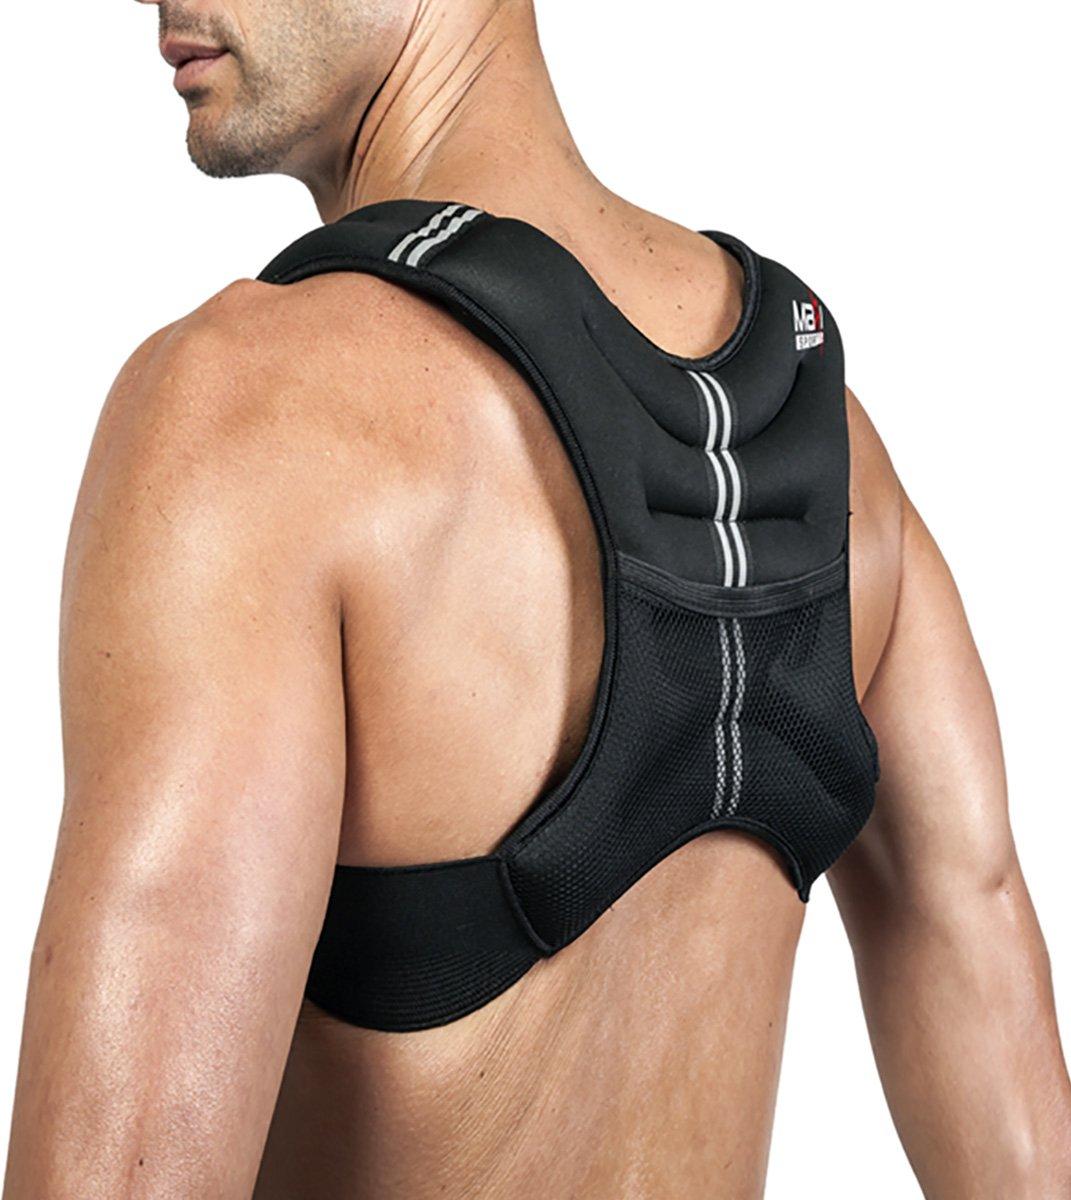 Maxi Sport - Weight Vest By Maxi Climber Inova